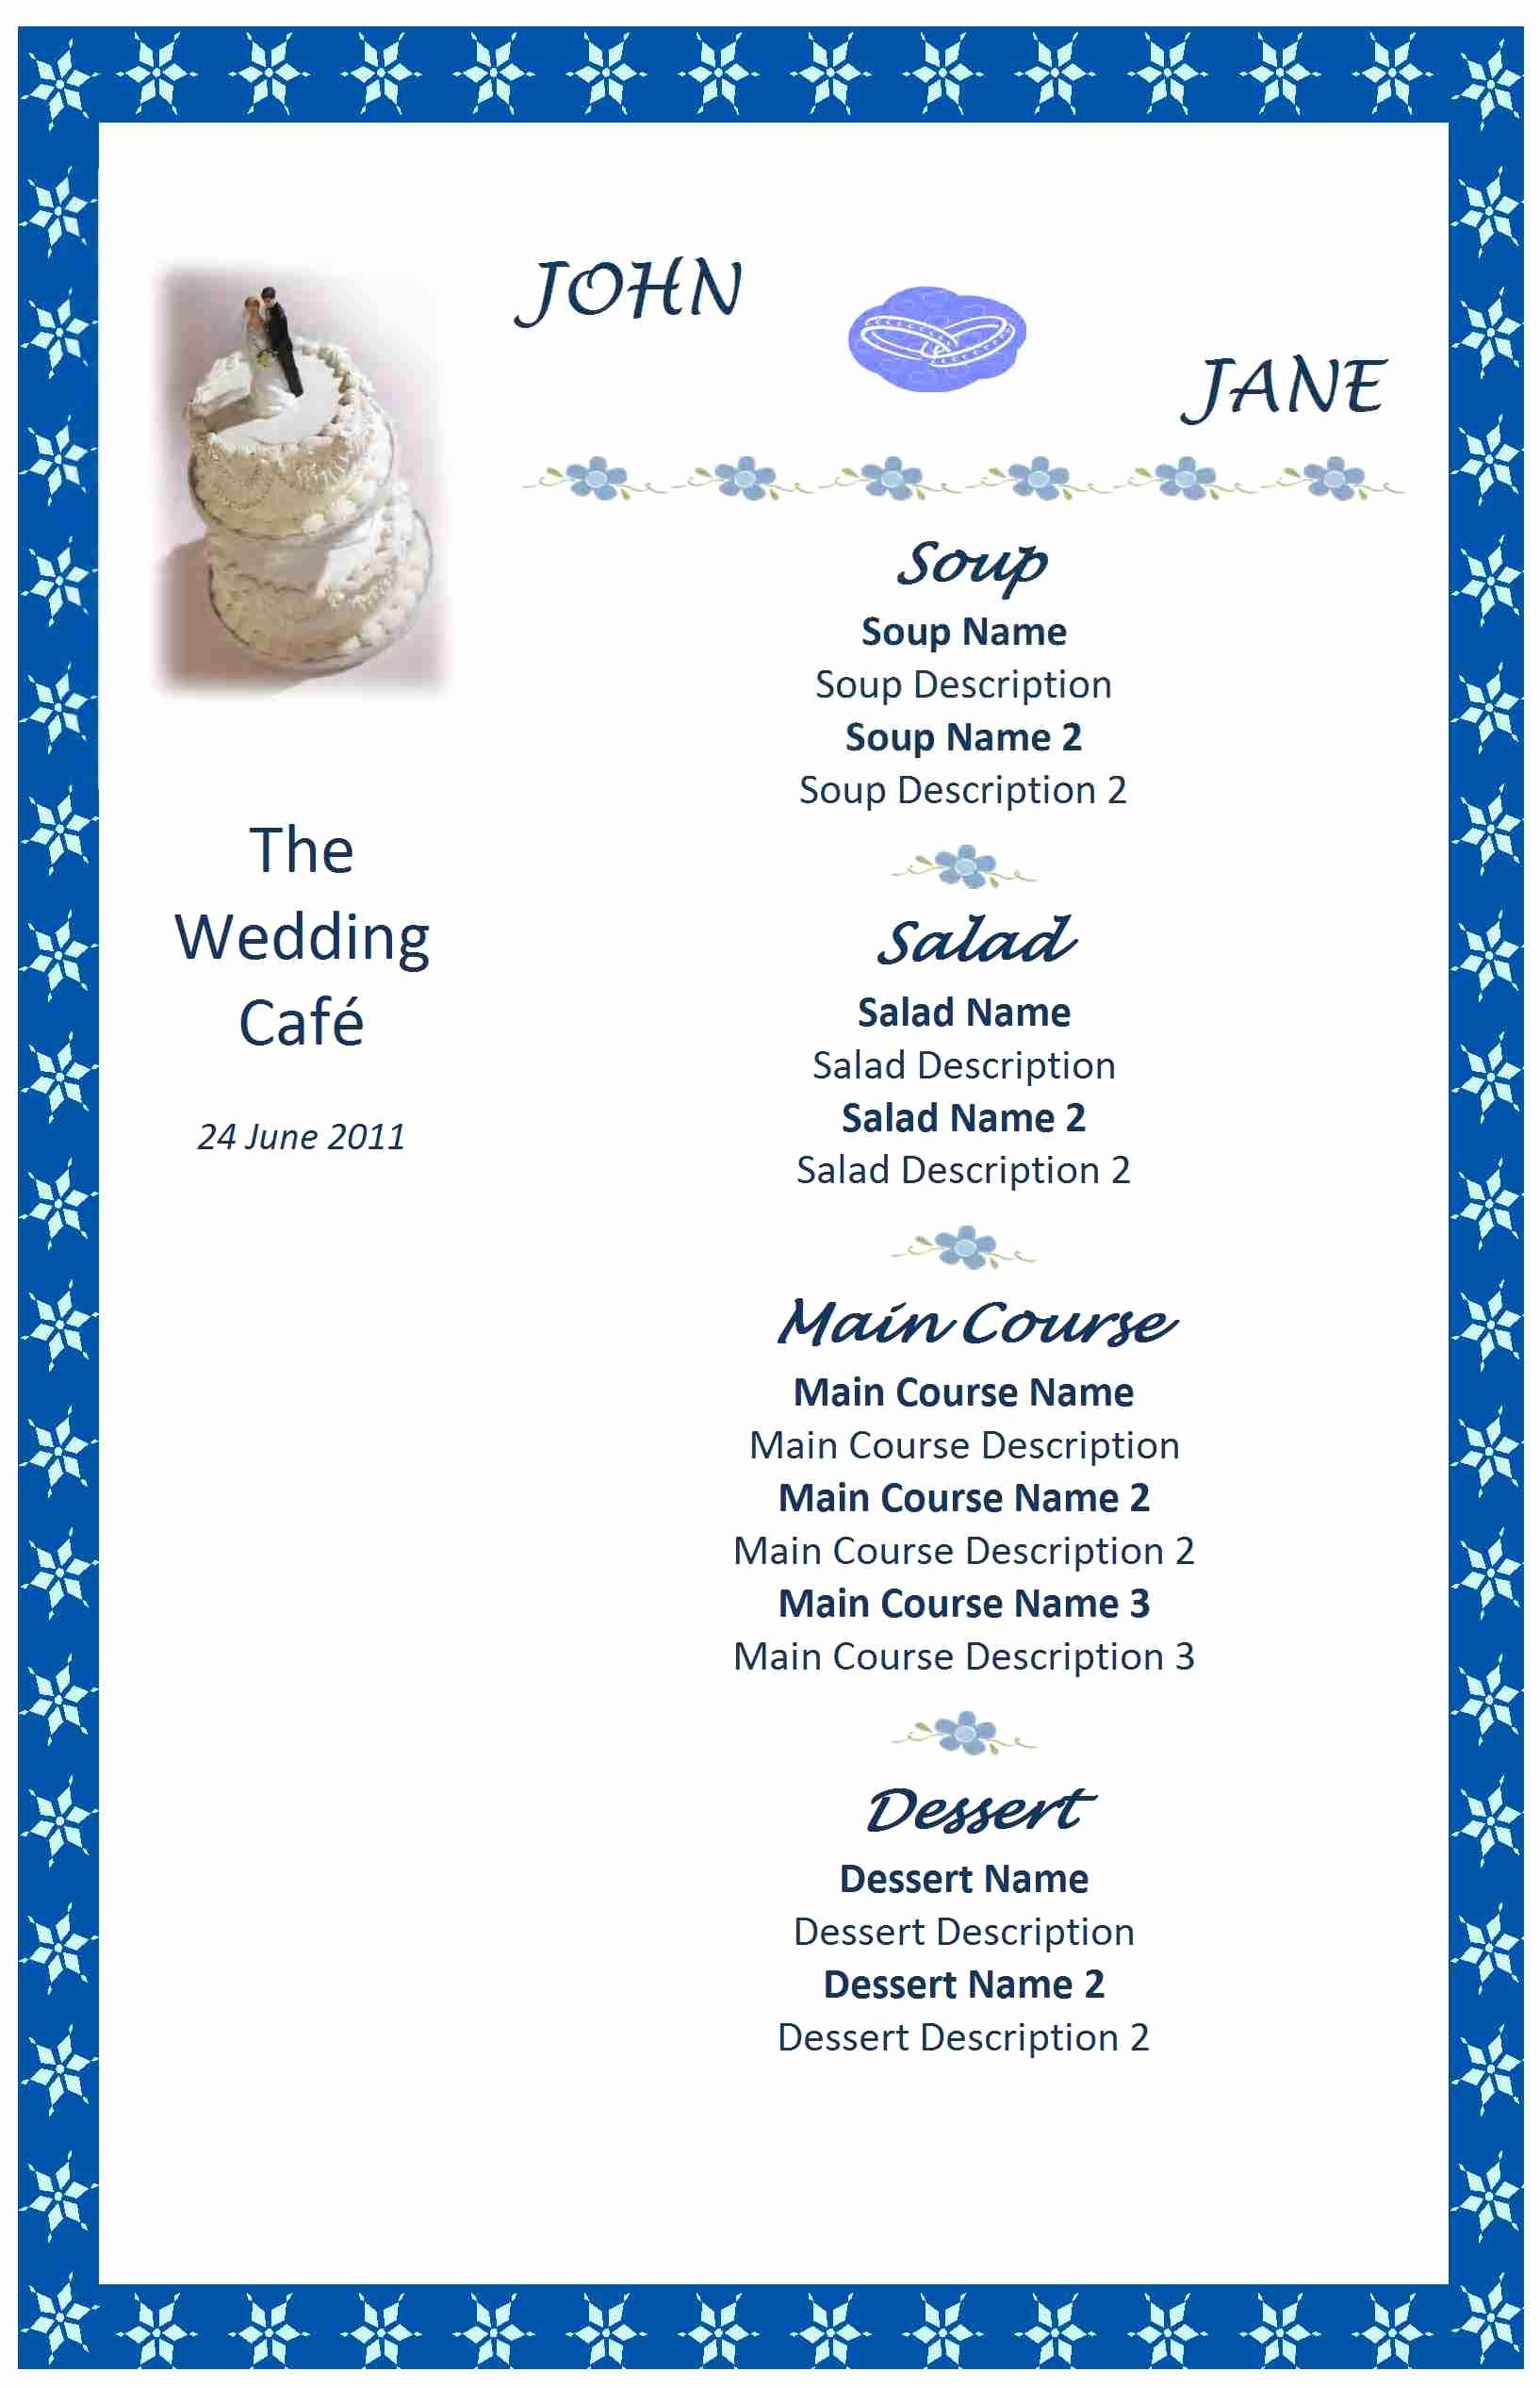 Wedding Invitations Templates Microsoft Word Inspirational Ms Word Invitation Template Portablegasgrillweber